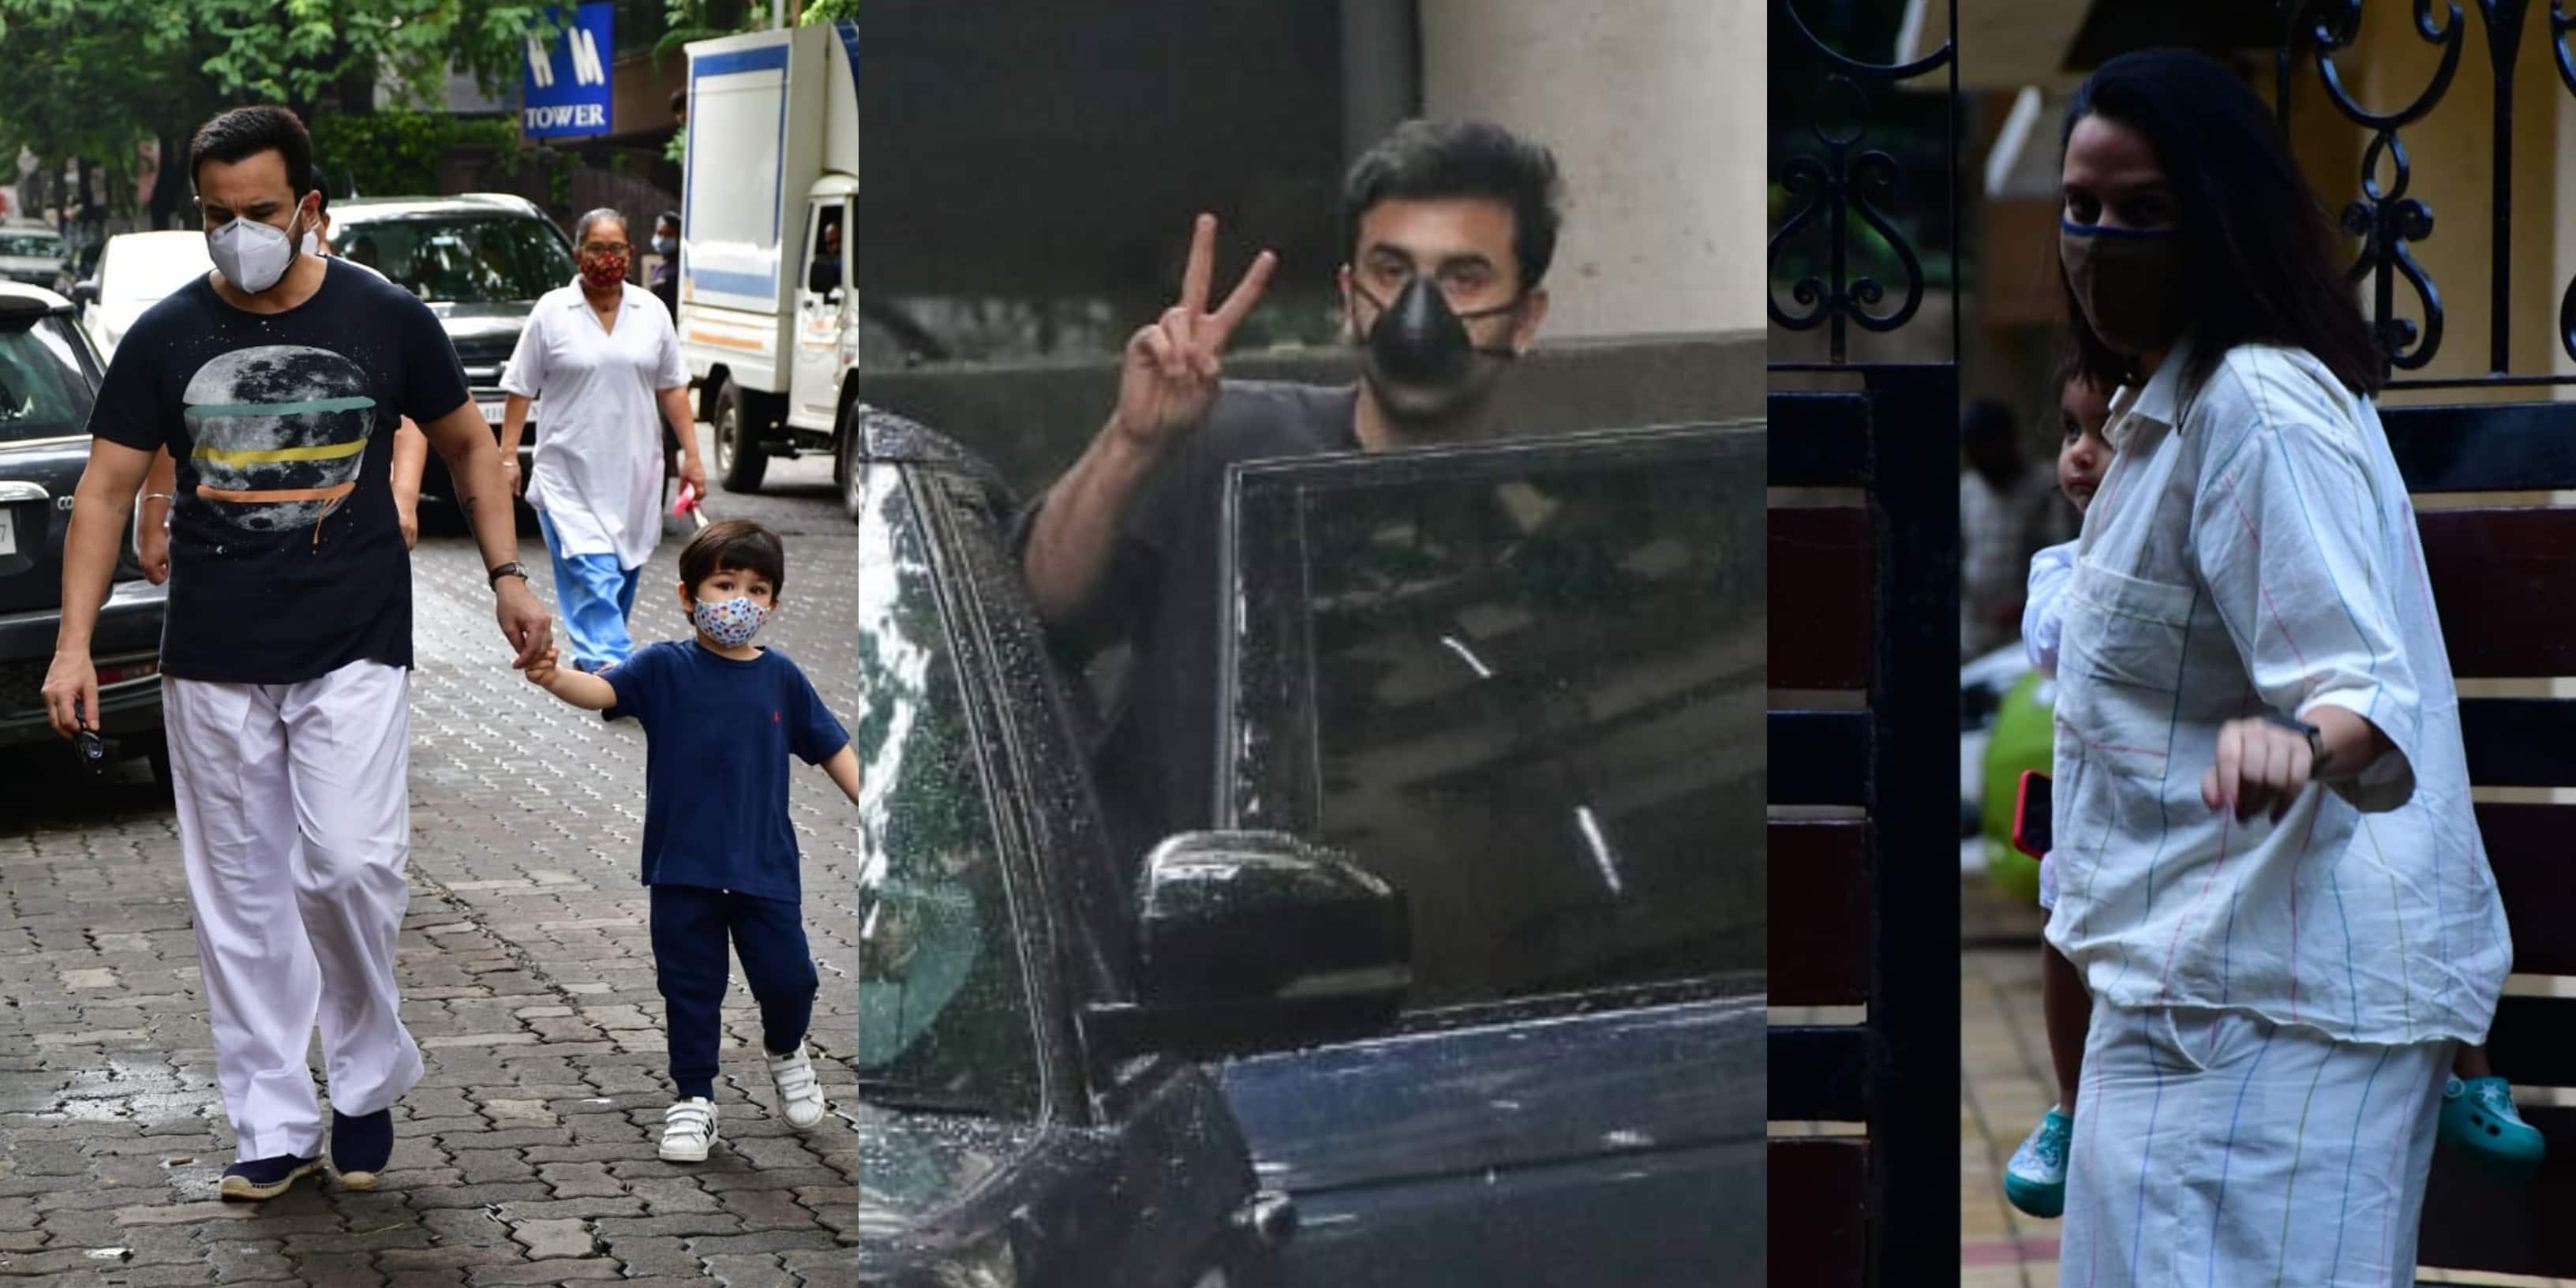 Spotted: Saif Ali Khan Seen With Taimur, Ranbir Kapoor Goes To Sanjay Leela Bhansali's Office